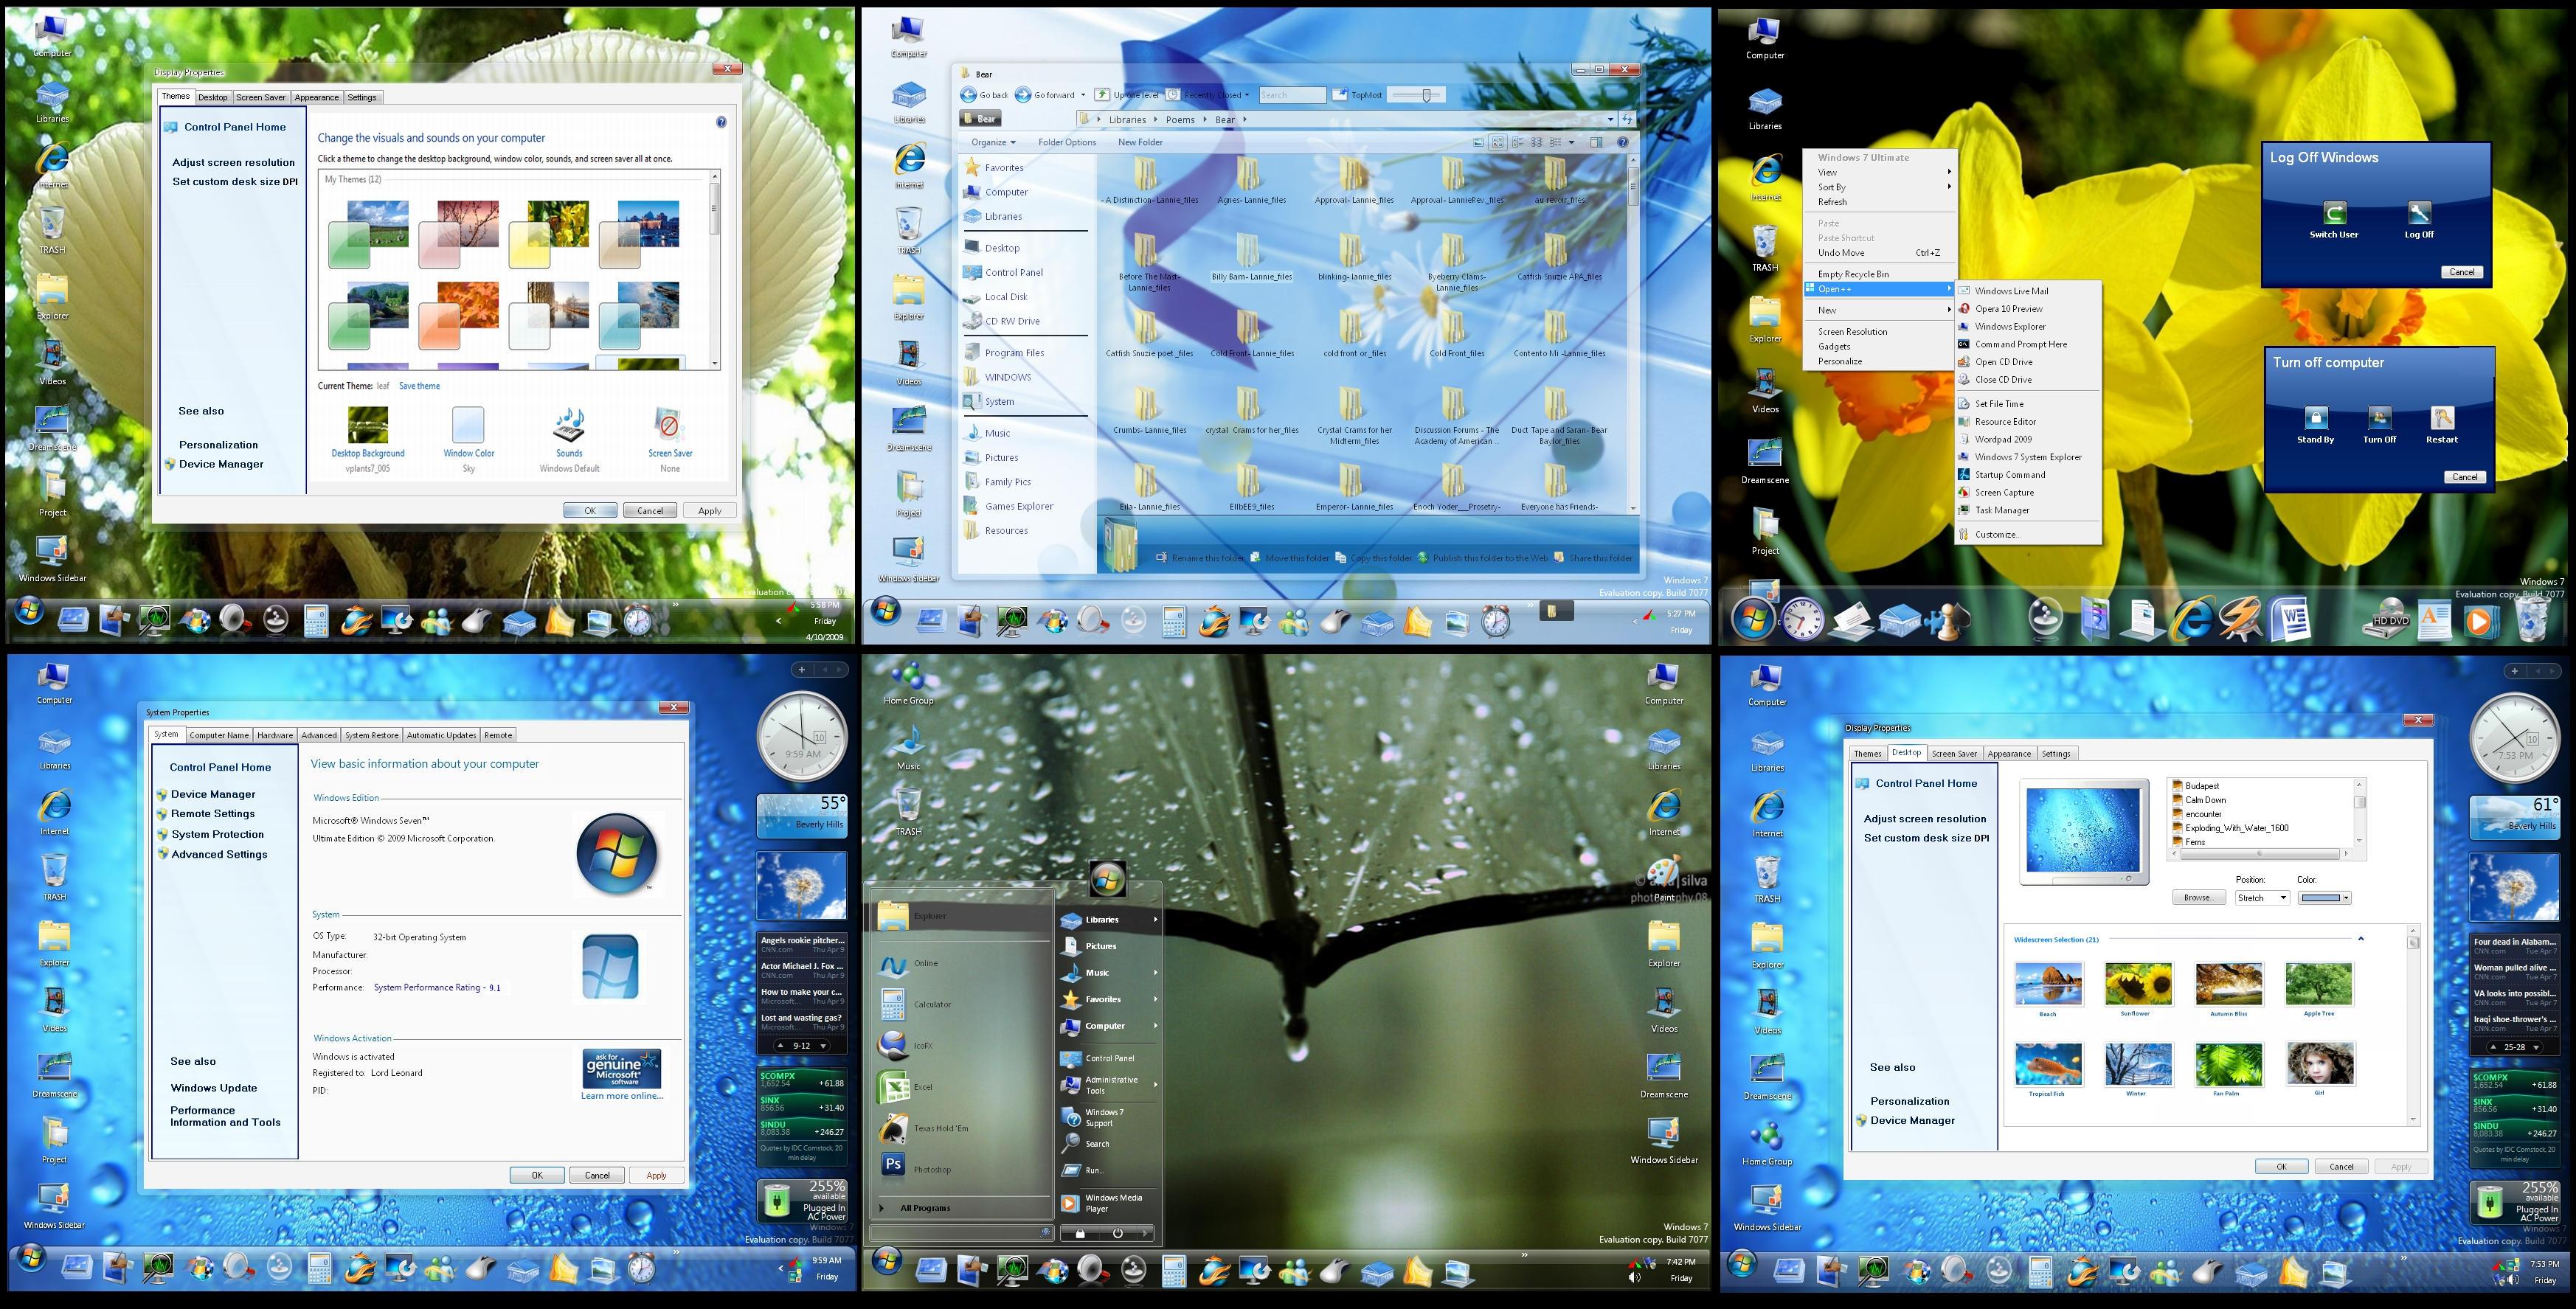 Windows 7 Classic for XP by DopeySneezy